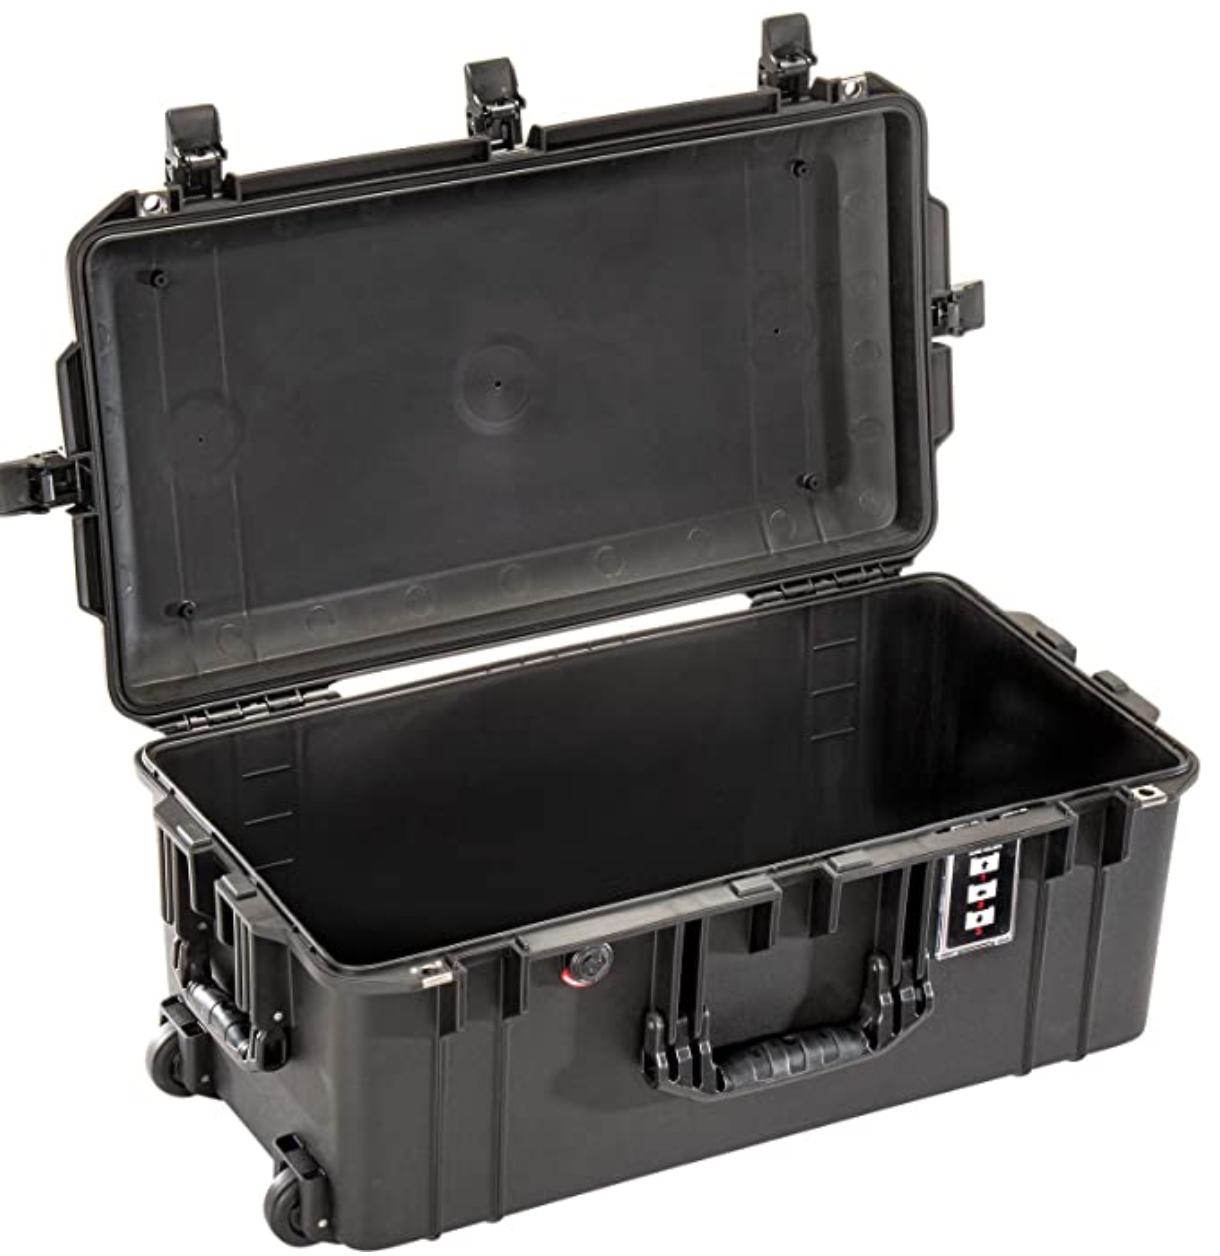 Review of Pelican Case 1606 Waterproof Dustproof Hard Case